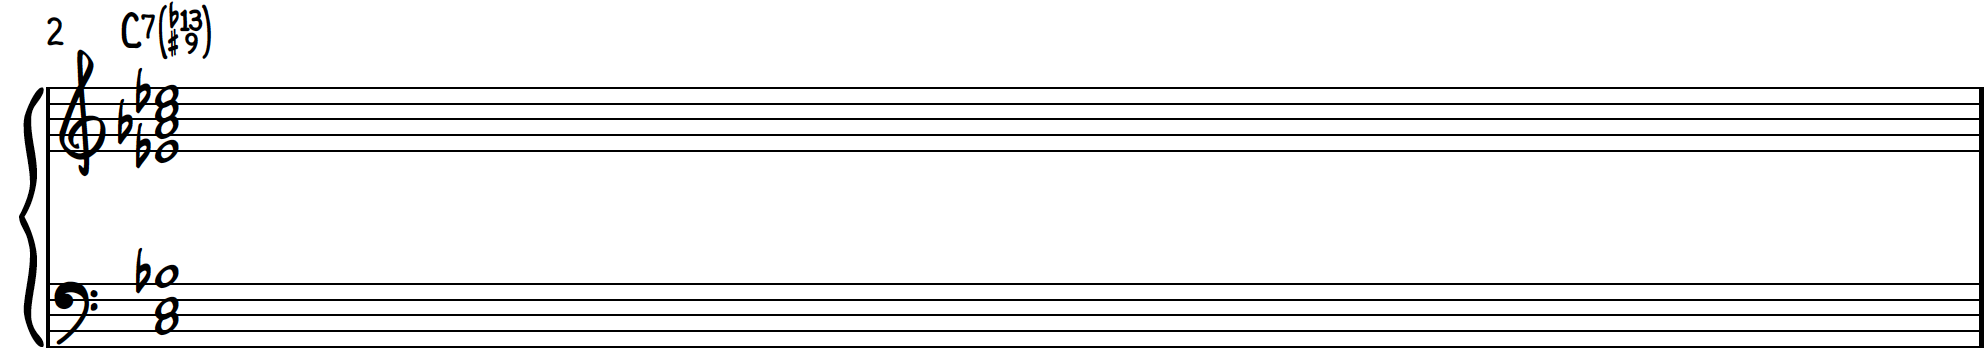 Dissonant Chord 1 transformed to jazz chord C7b13(#9) on piano